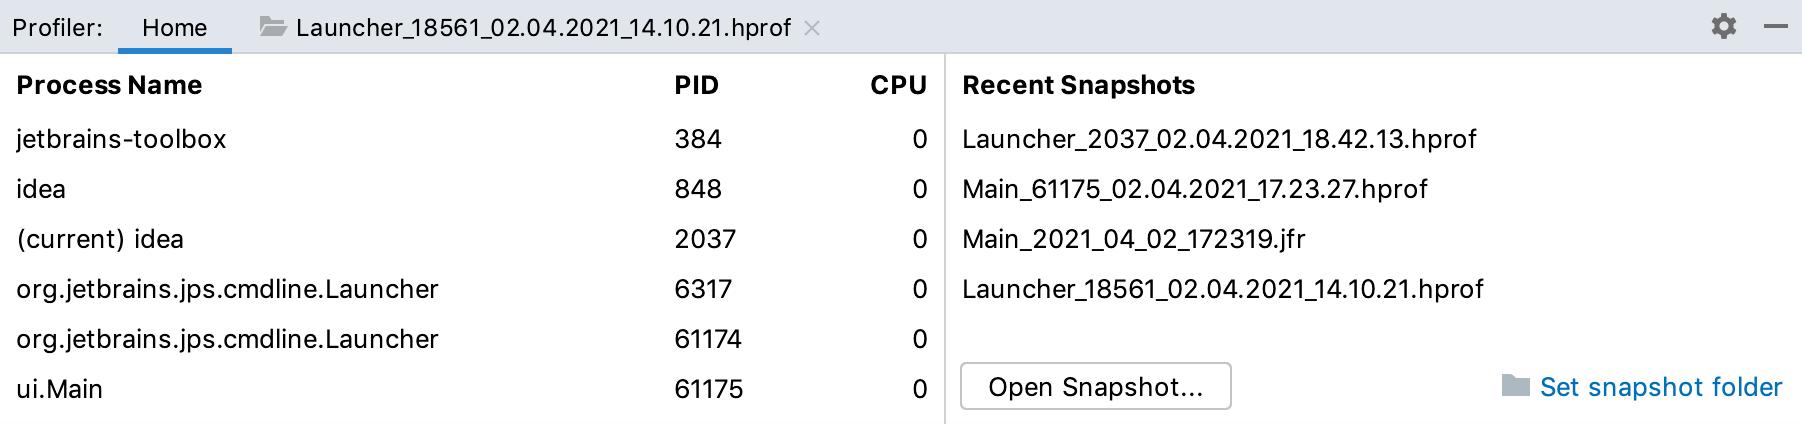 Profiler tool window